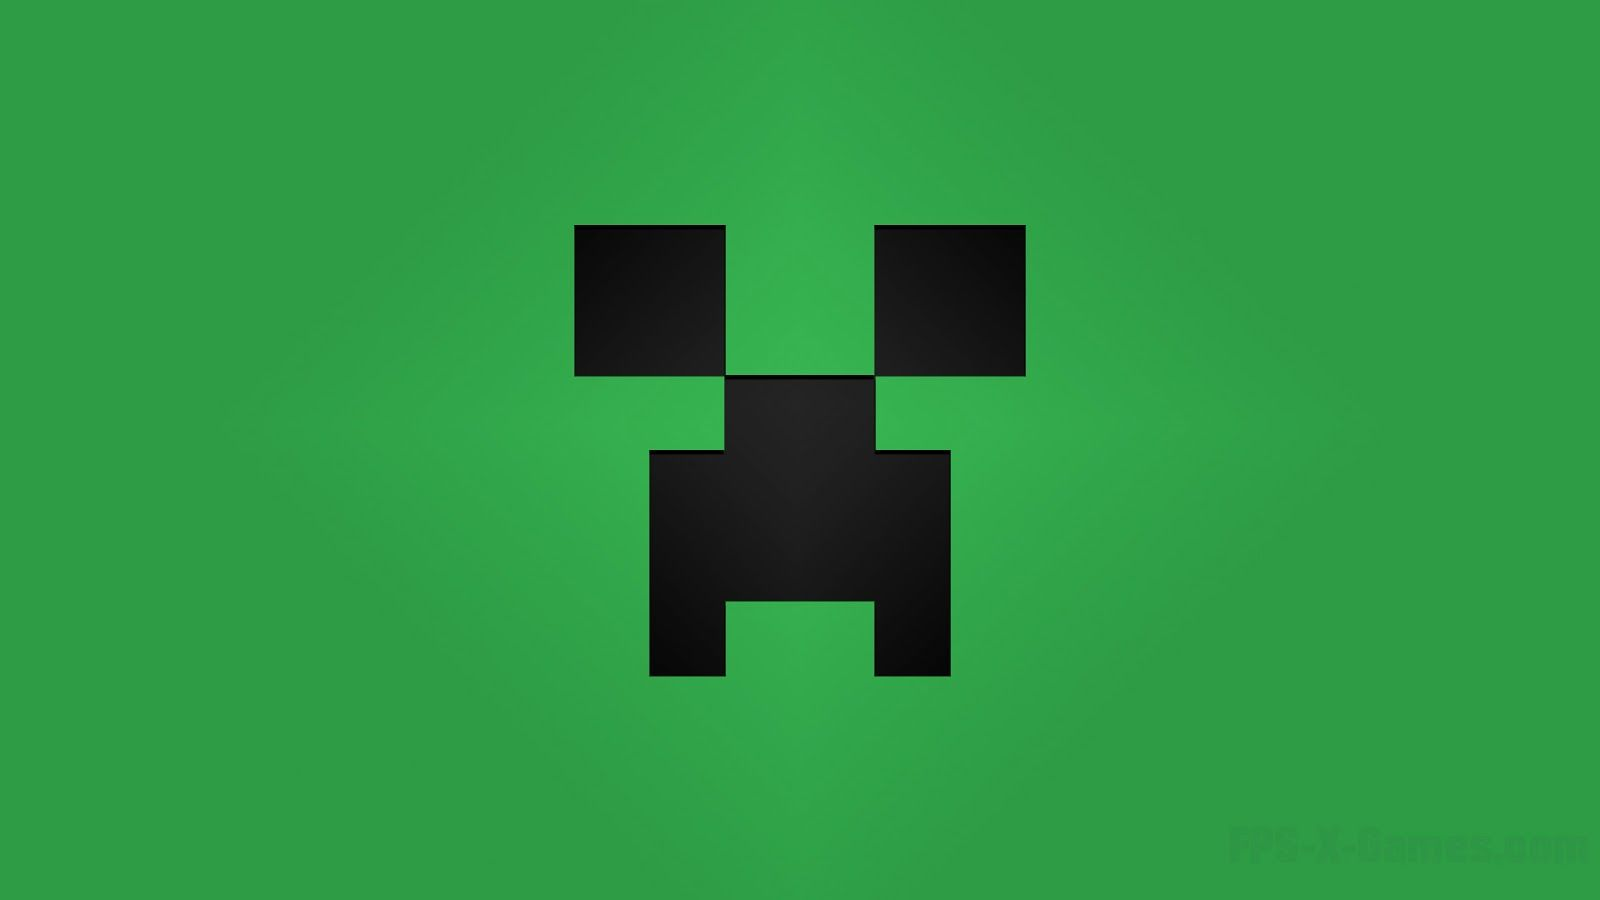 Minecraft Creeper Desktop Wallpapers Green Minecraft Images Minecraft Wallpaper